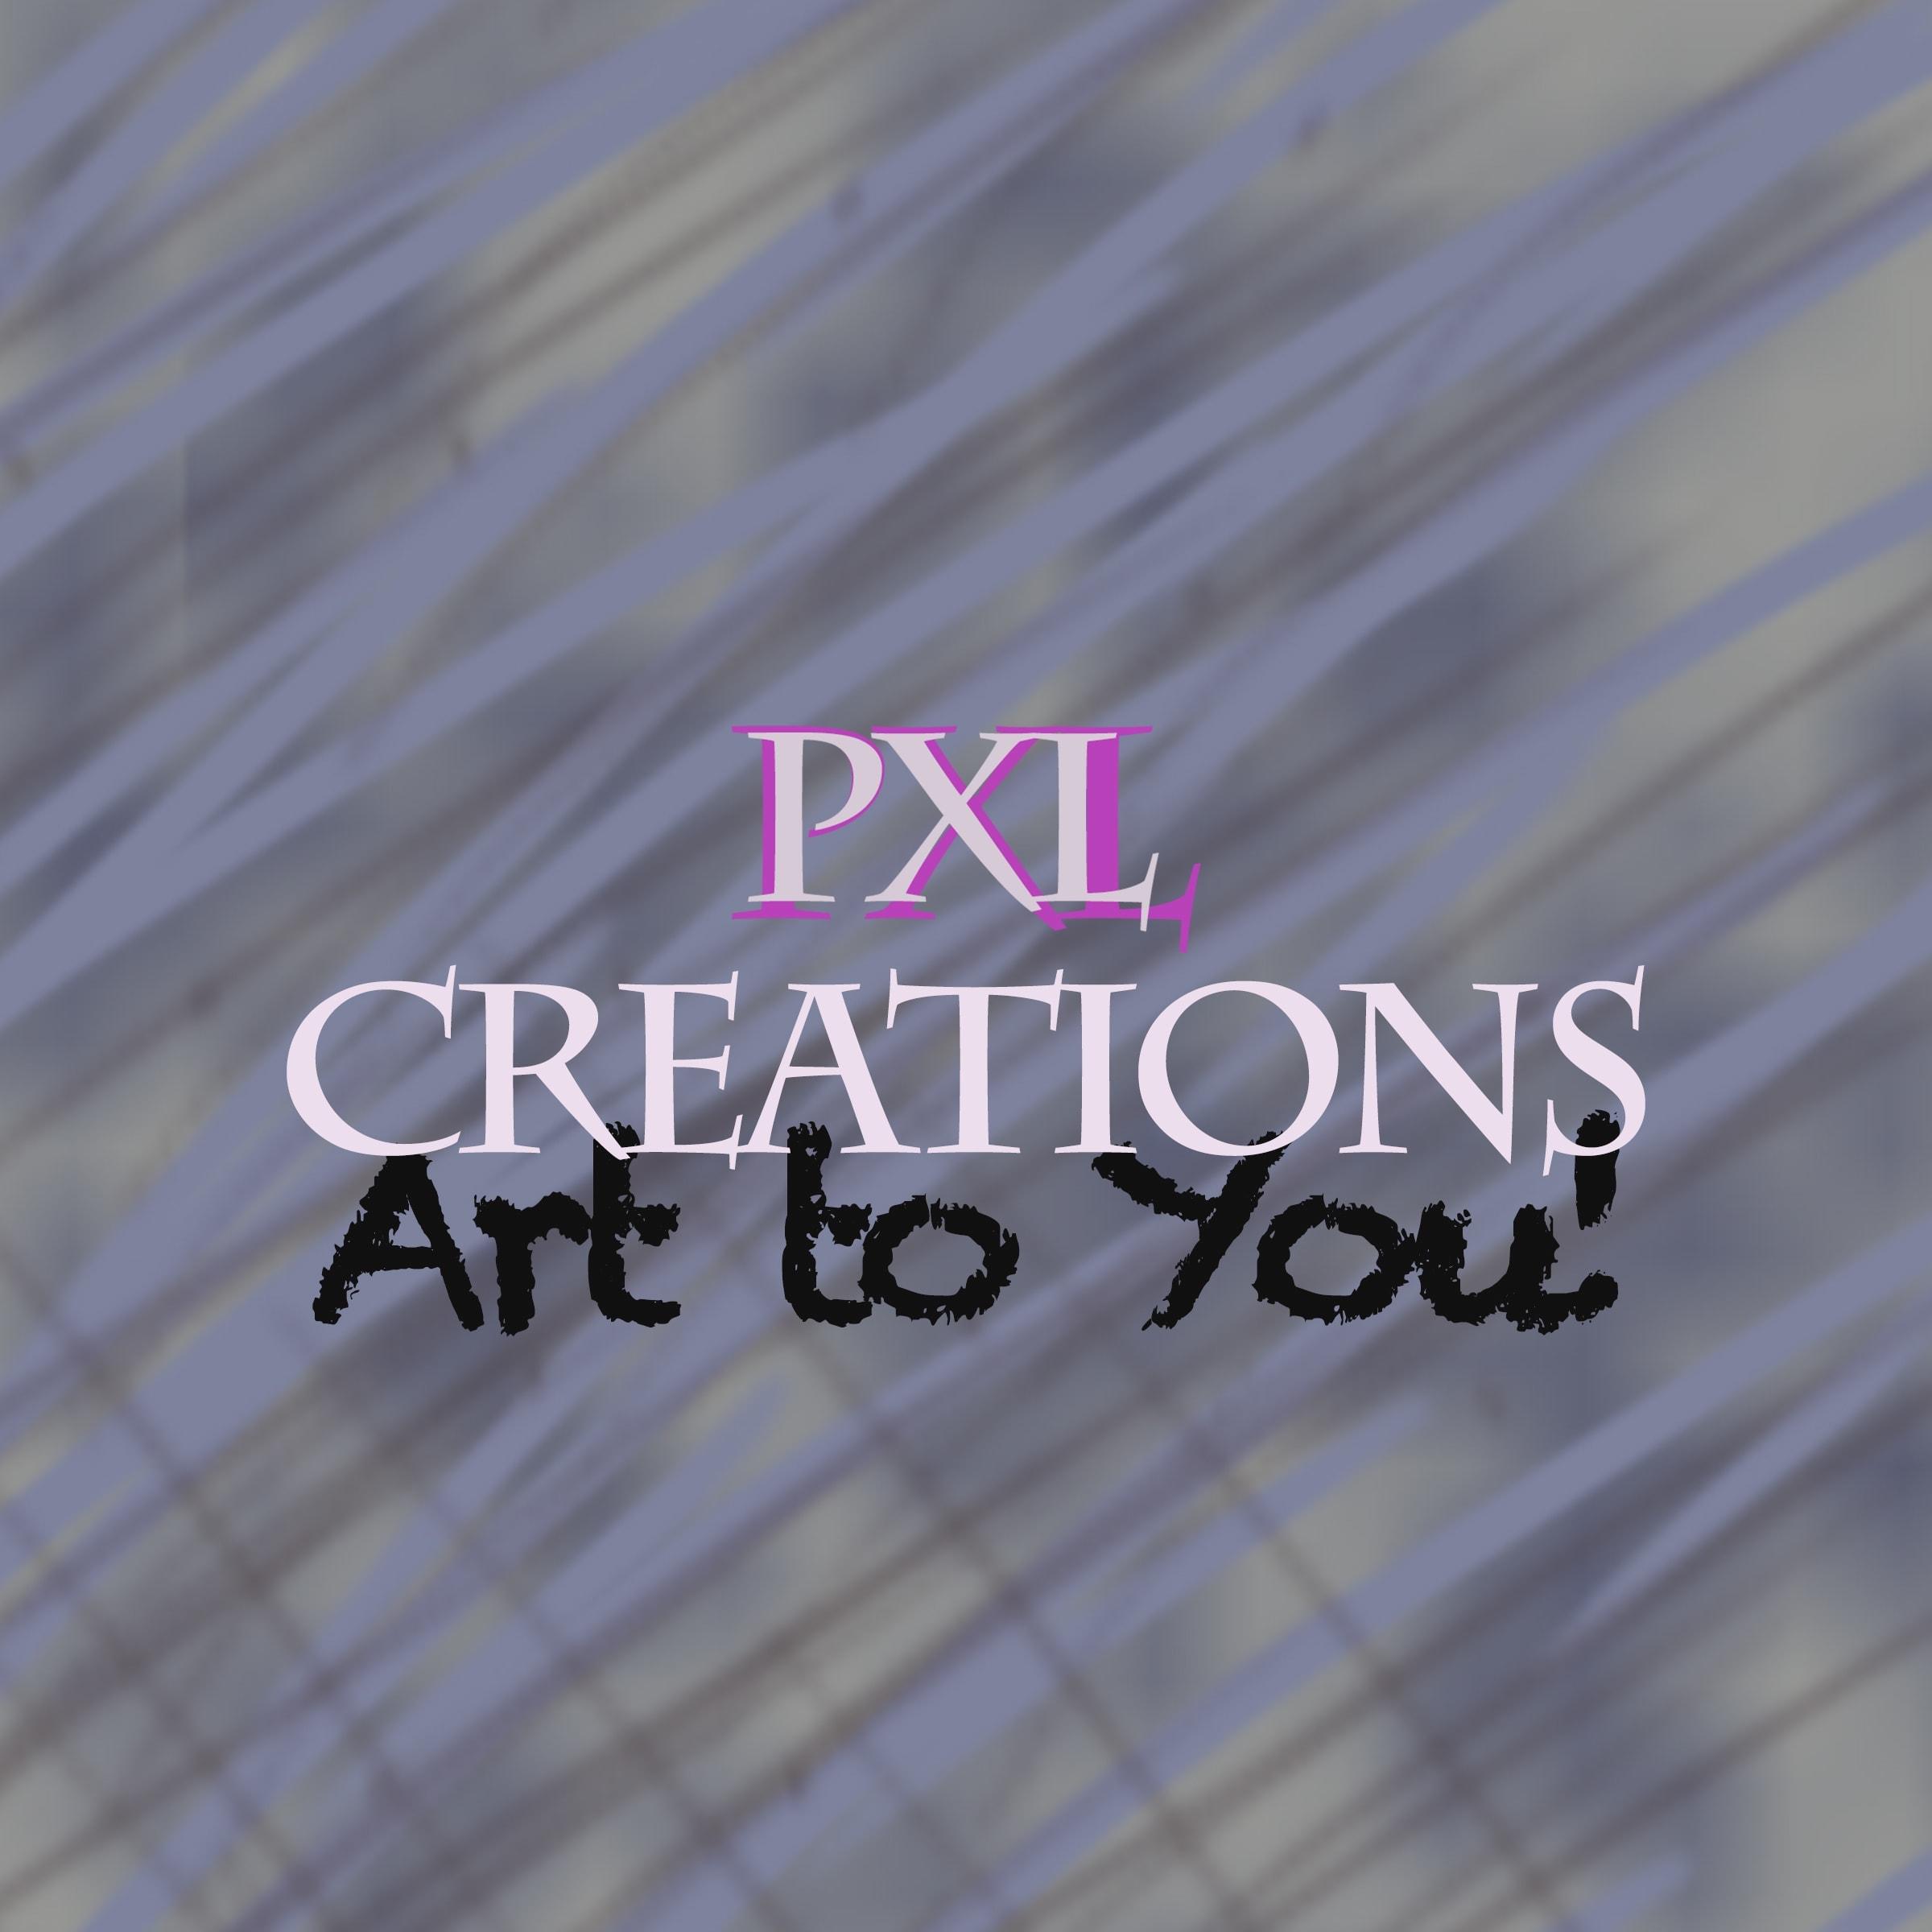 Pixeline Creations Art To You